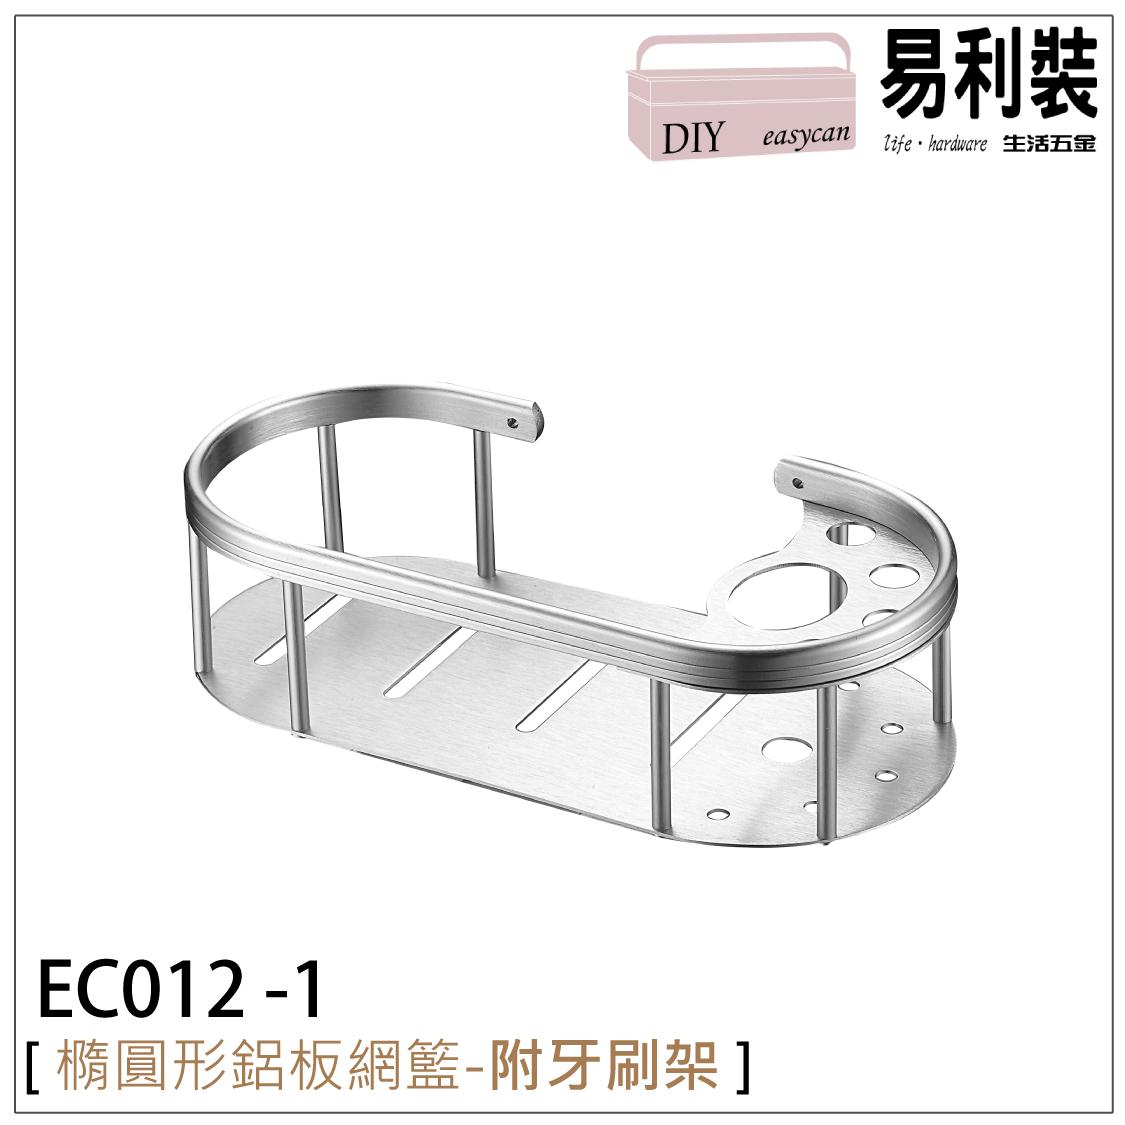 【 EASYCAN  】EC012-1 橢圓形鋁板網籃附牙刷架 易利裝生活五金 鋁合金 置物架 收納架 廚房 餐廳 房間 浴室 小資族